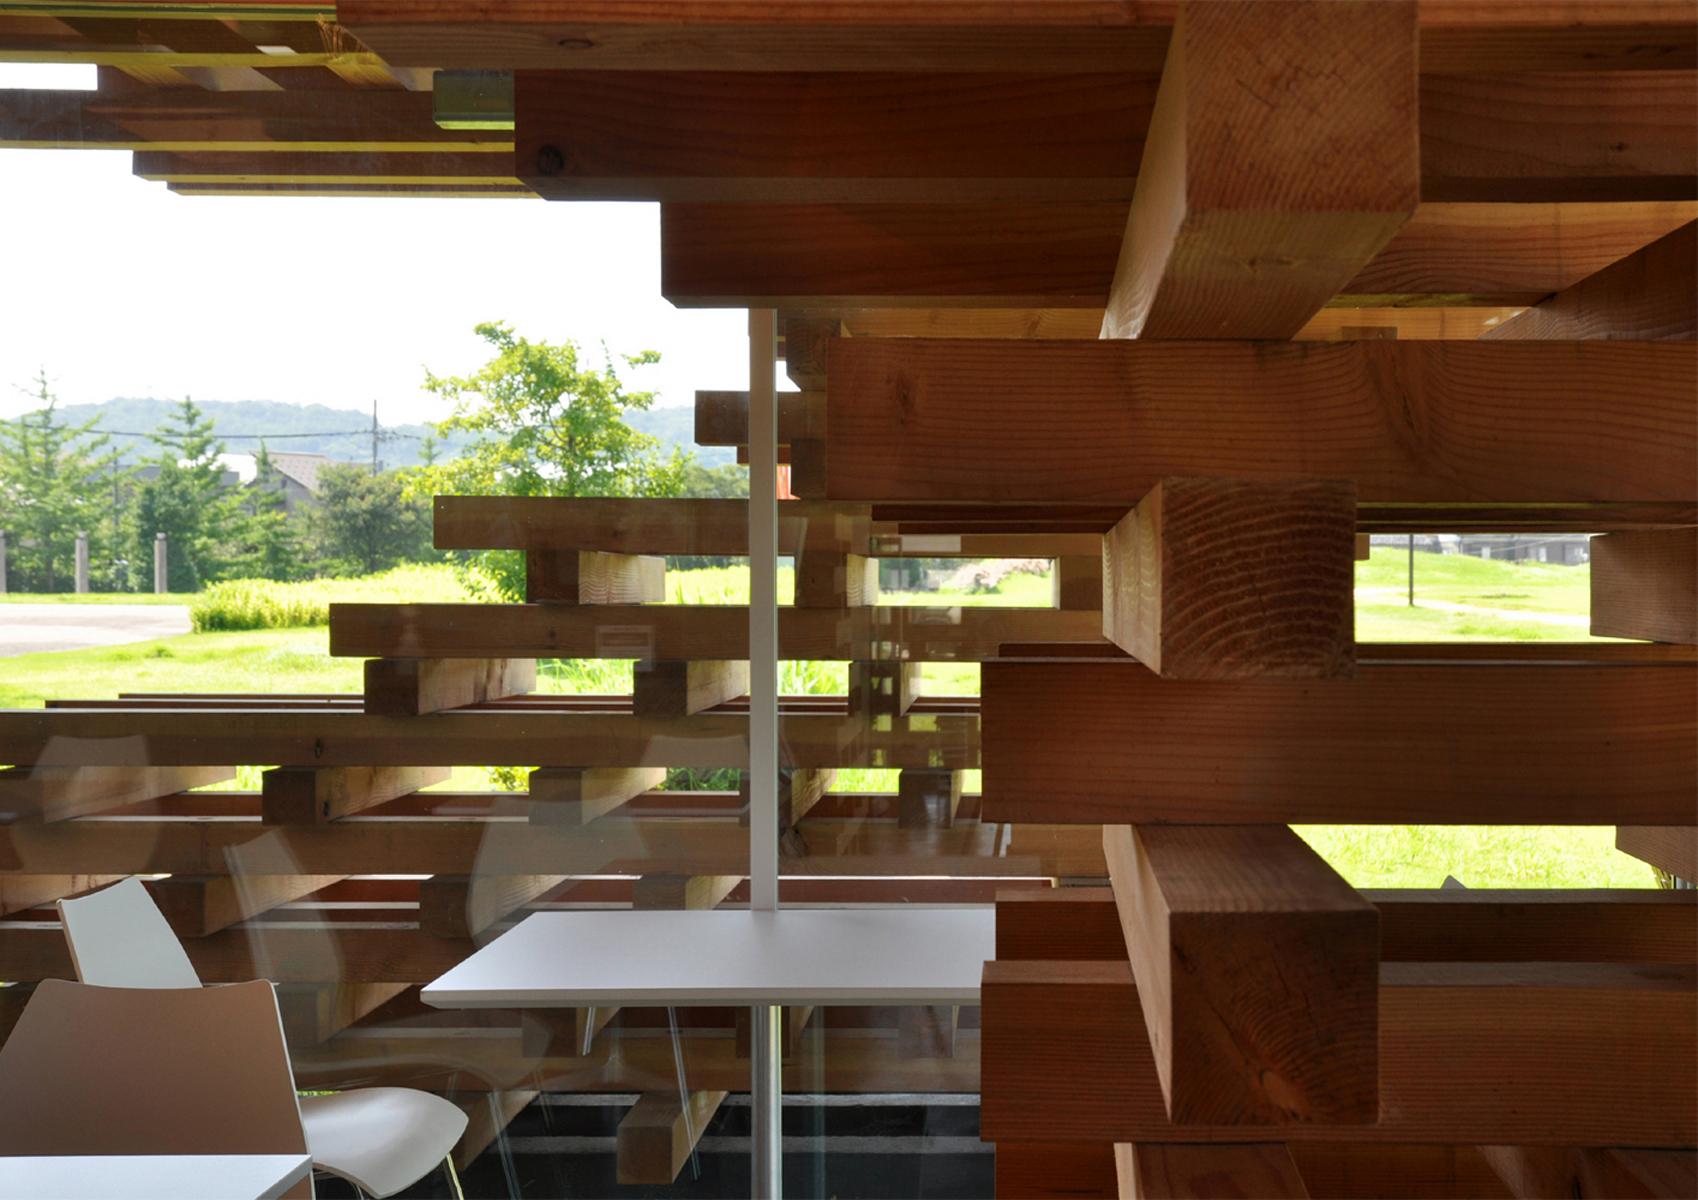 Café kureon — カフェ・クレオン architecture kengo kuma and